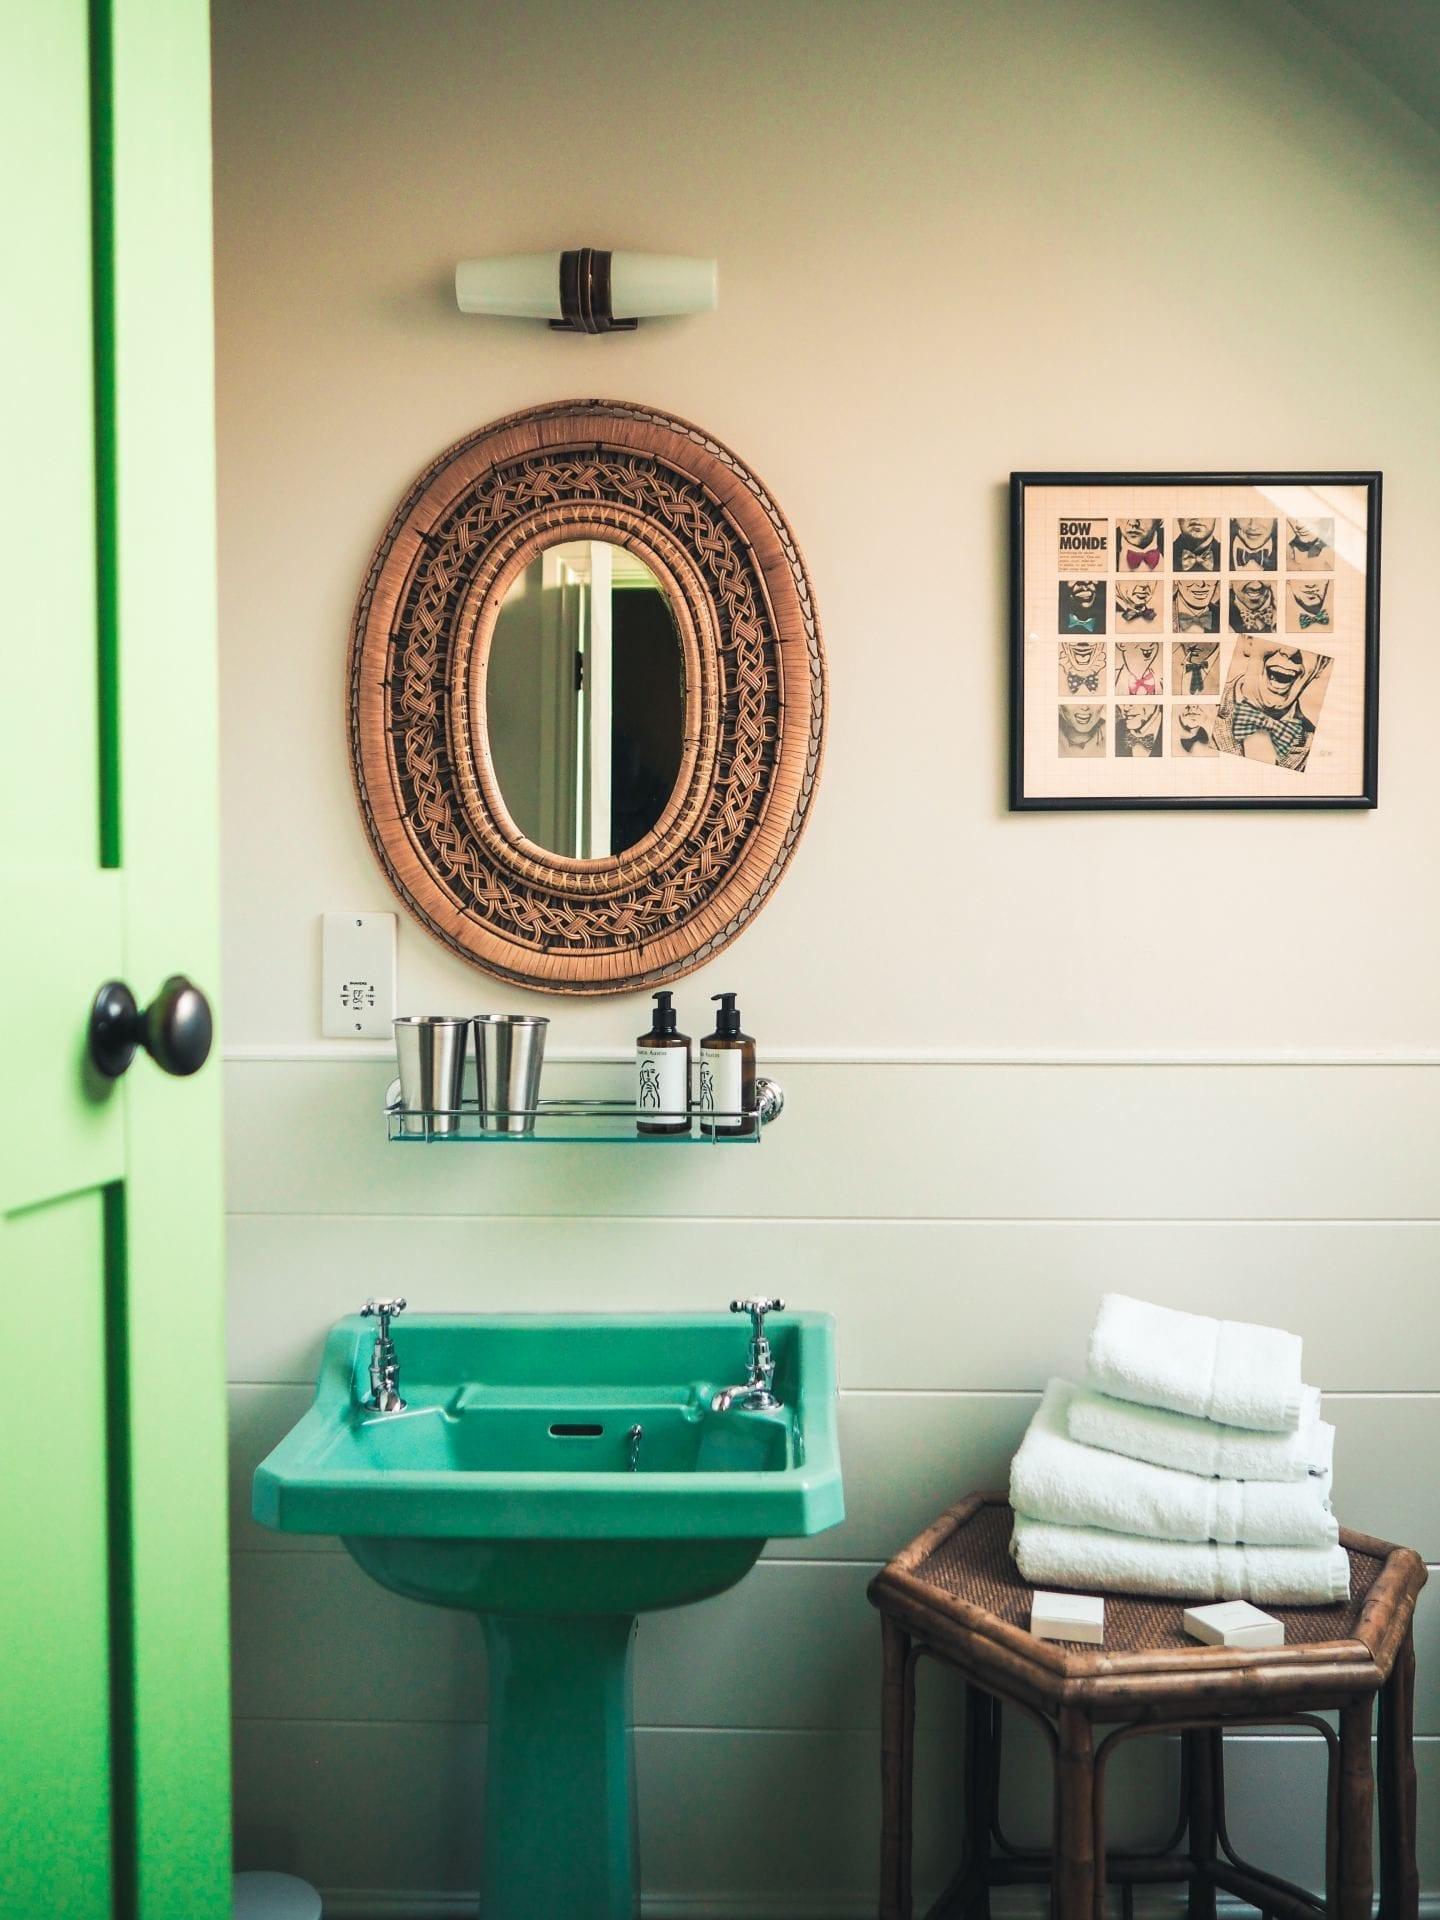 the rose deal kent decor interior design green bathroom bamboo detailing details